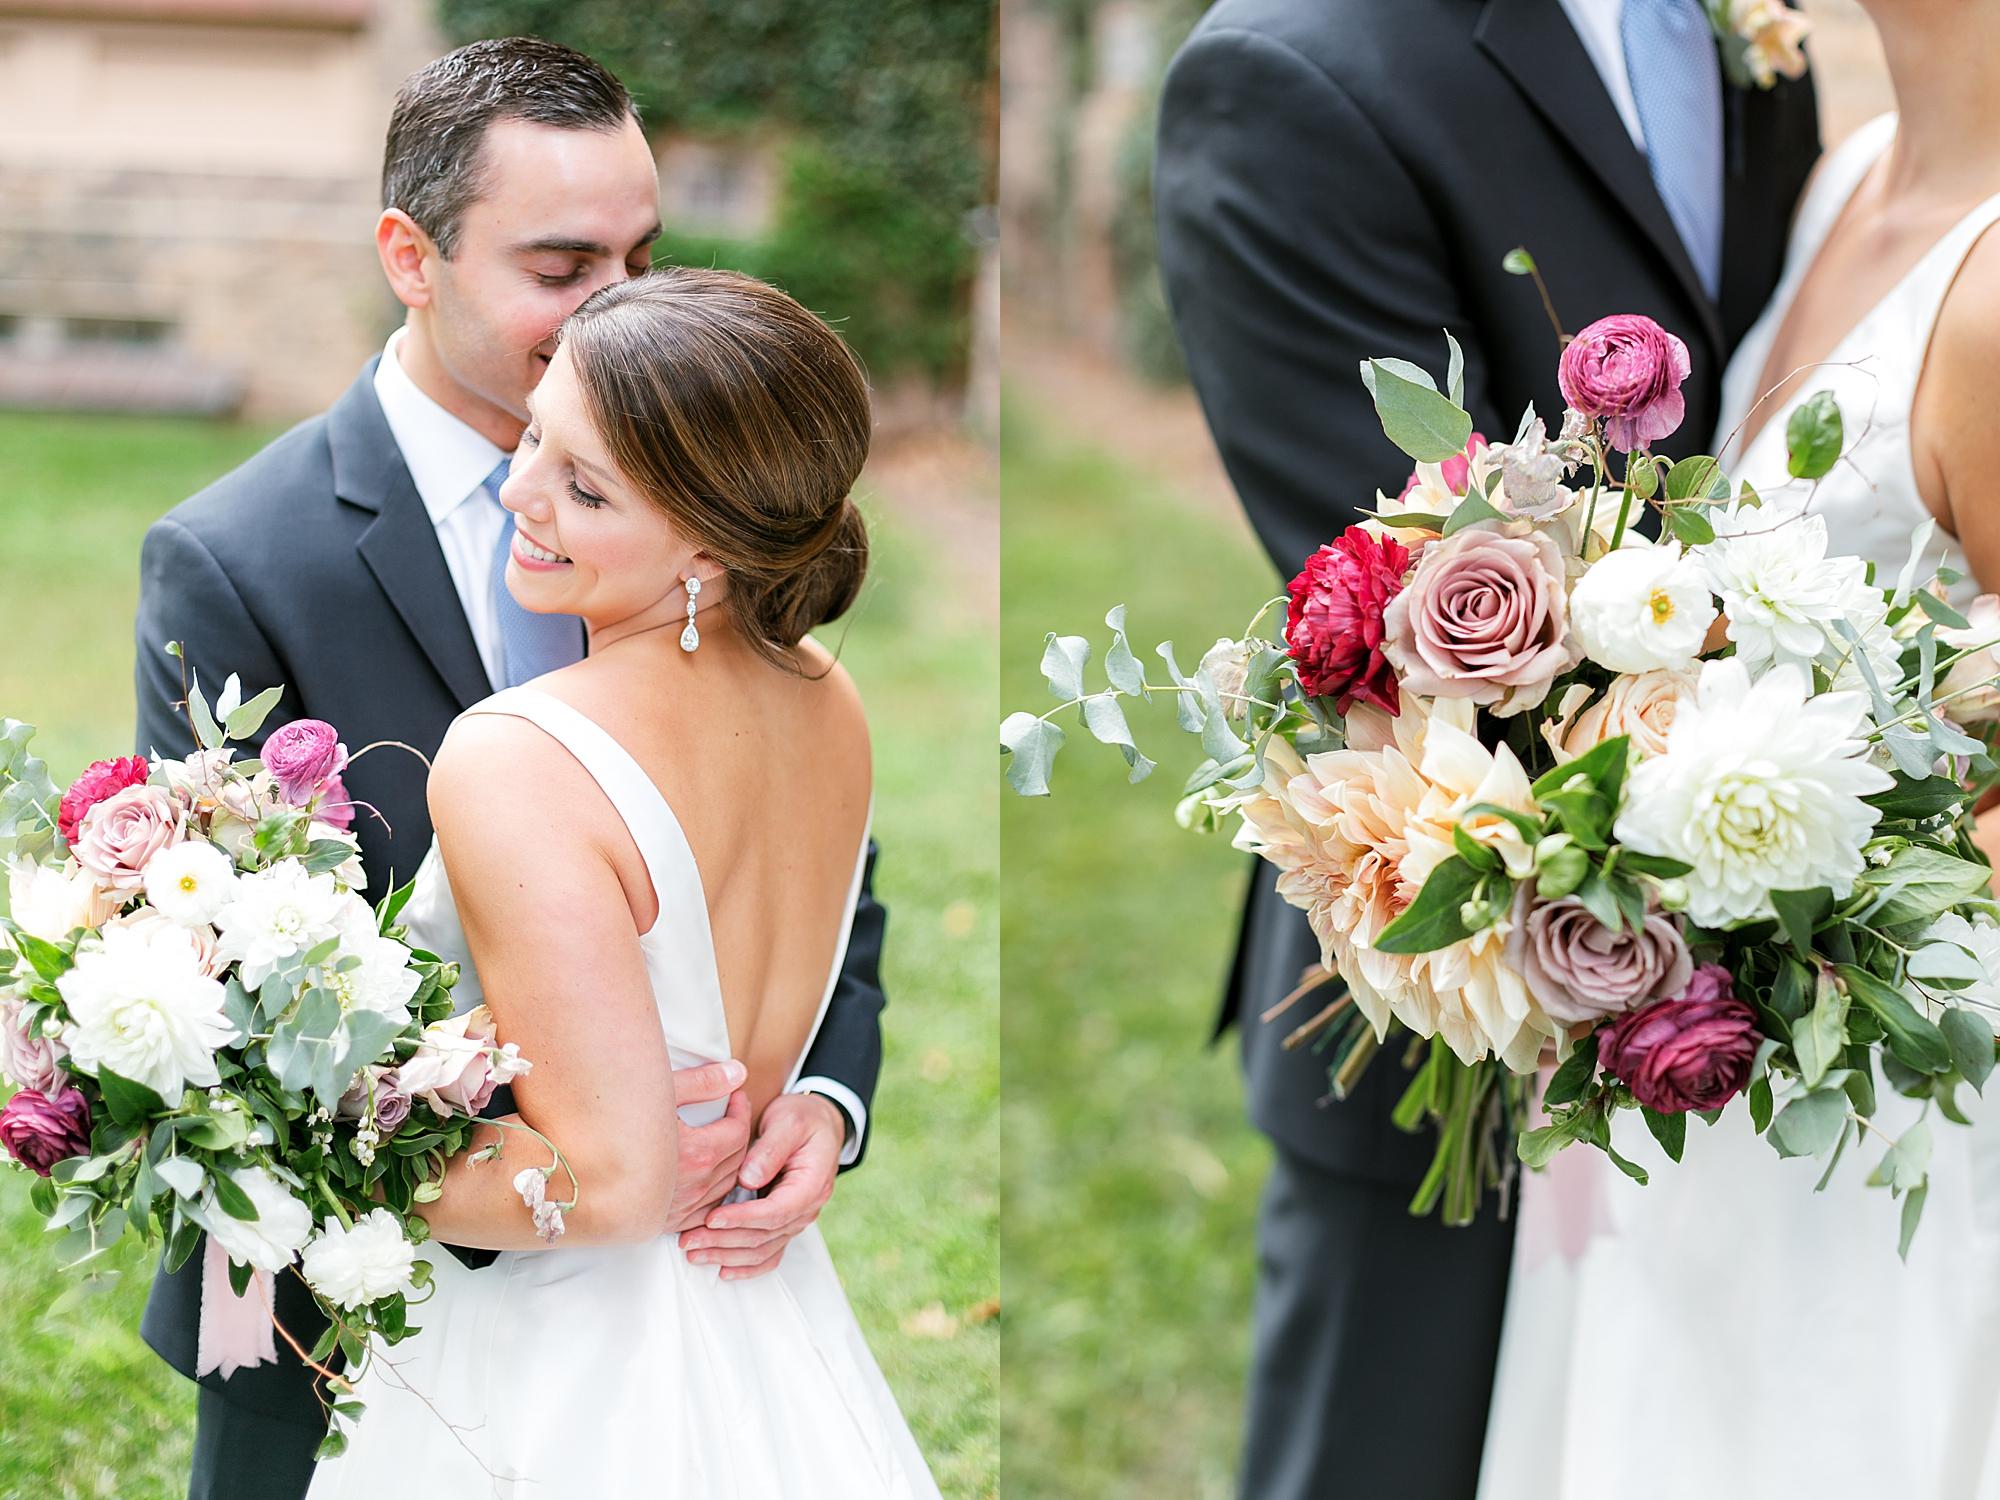 Princeton New Jersey Film Wedding Photographer Princeton University Wedding Photography by Magdalena Studios NJ Wedding Photographer22